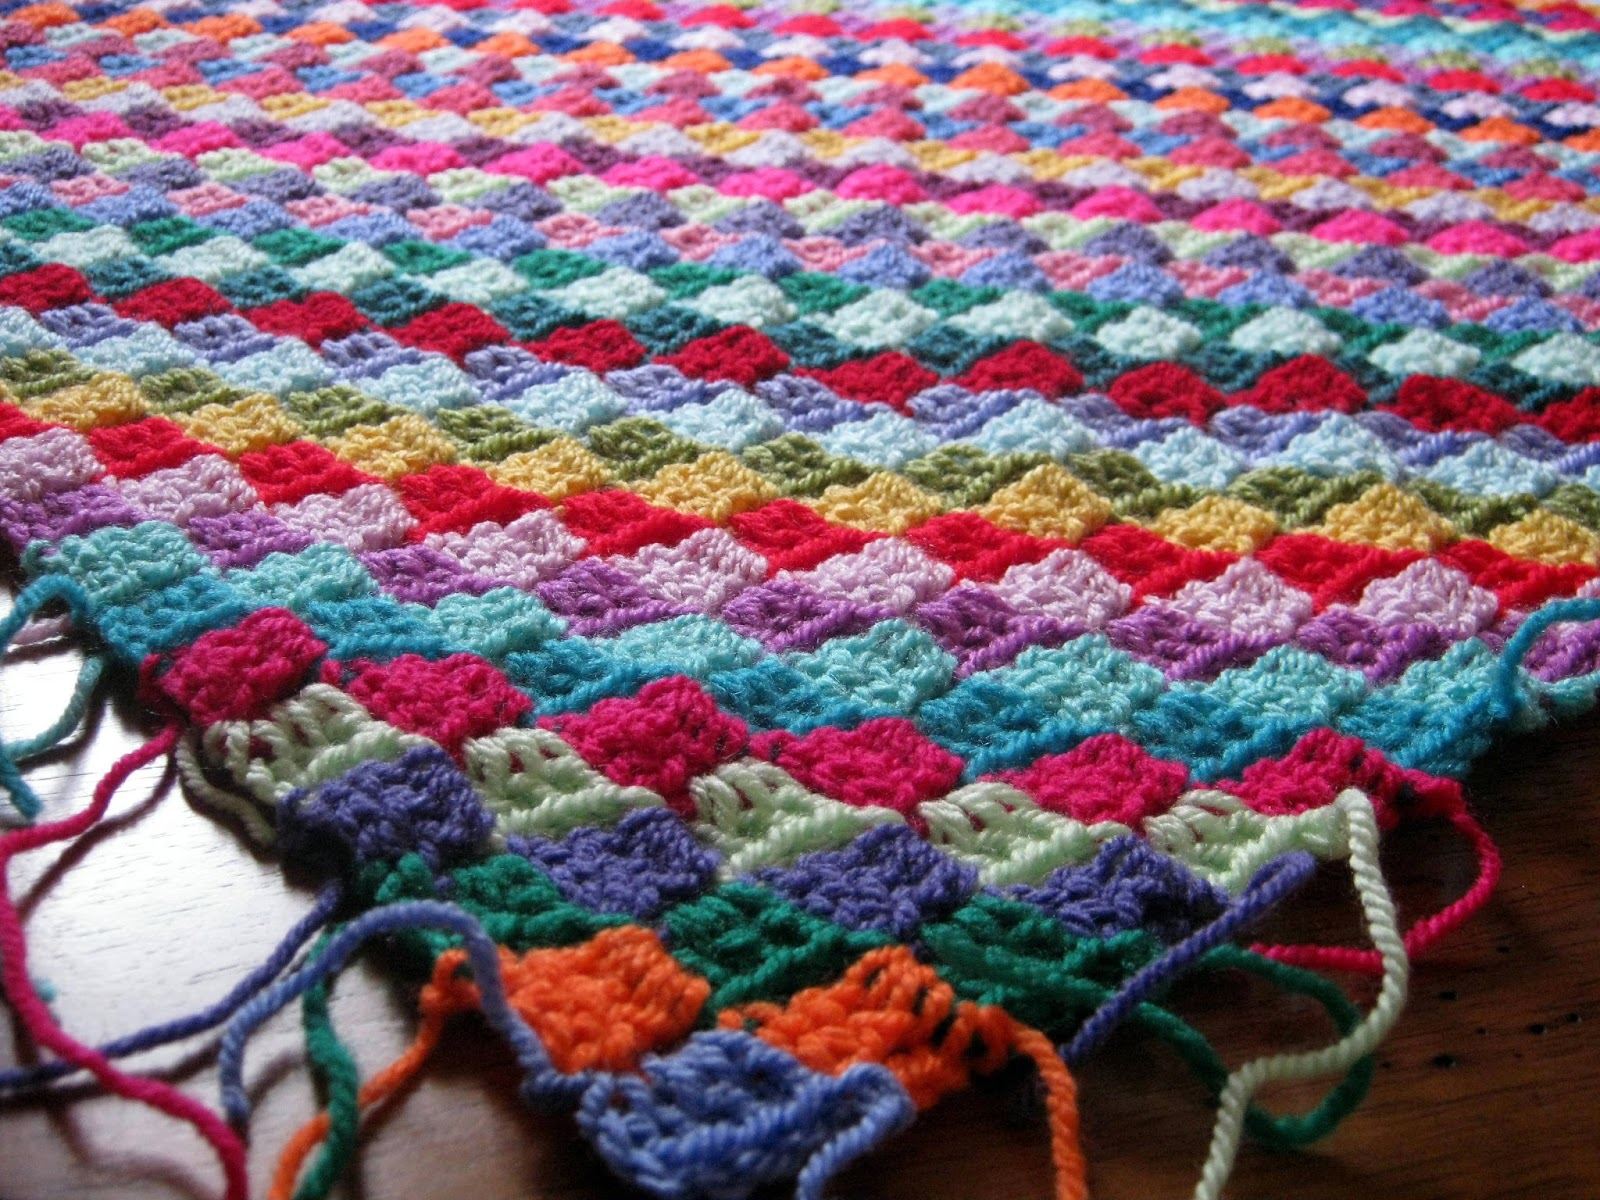 Mosaic Crochet Afghan Pattern : The Sunroom UK: Tiny Tiles Mosaic Crochet Blanket